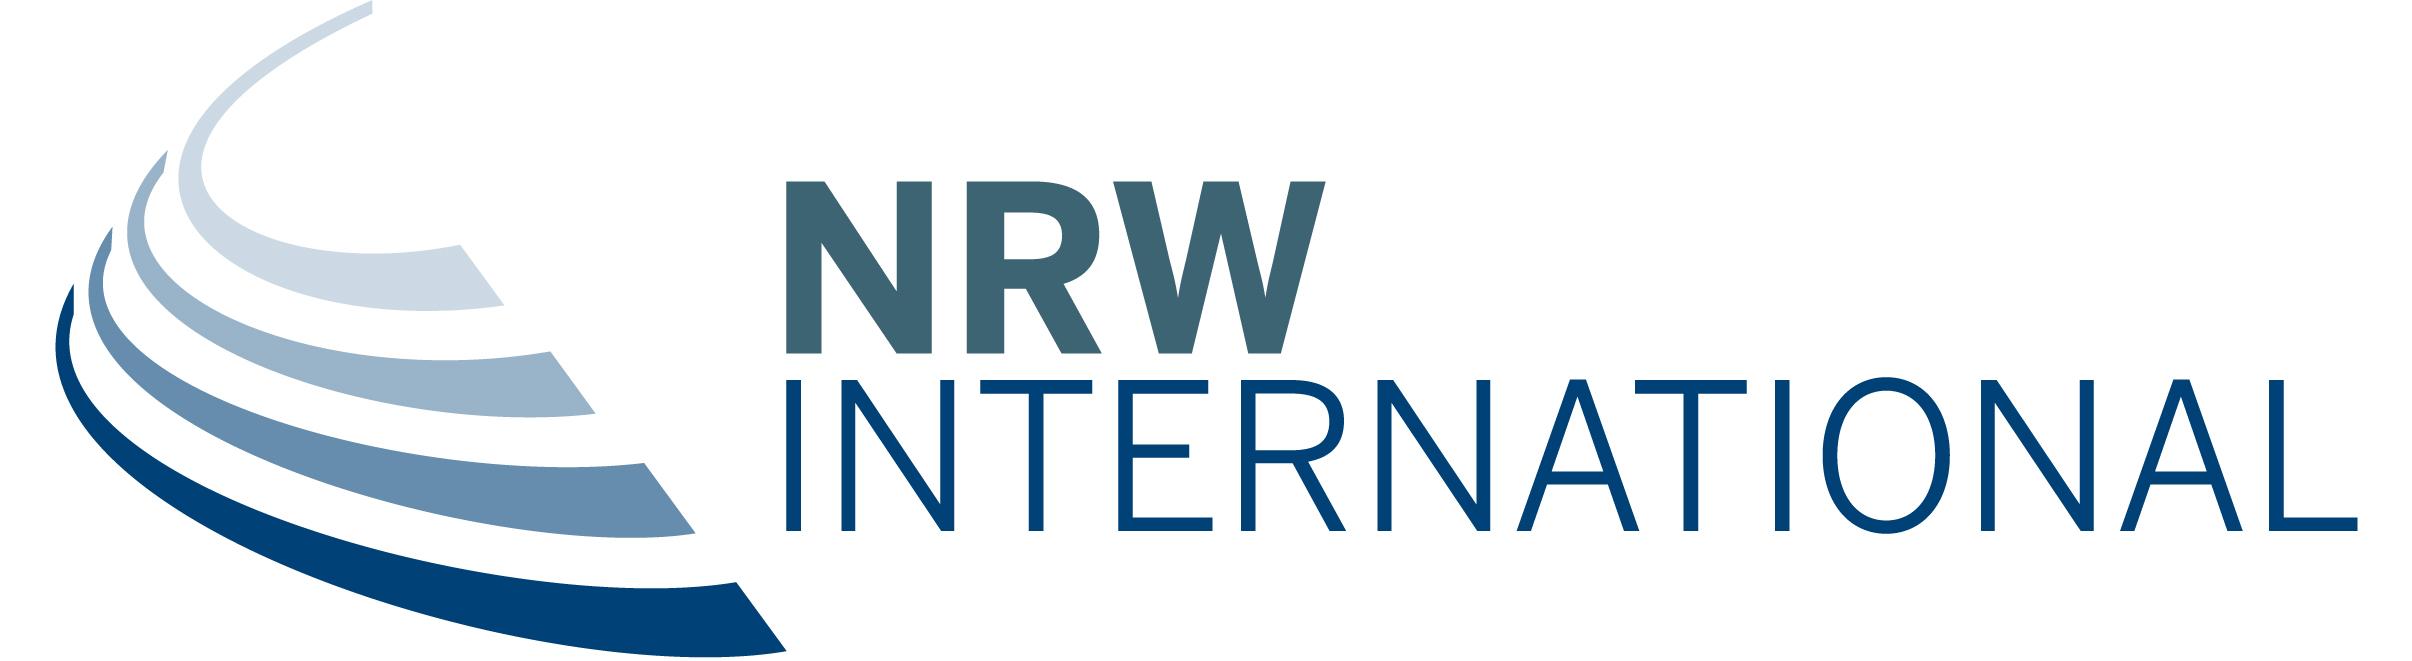 NRW International